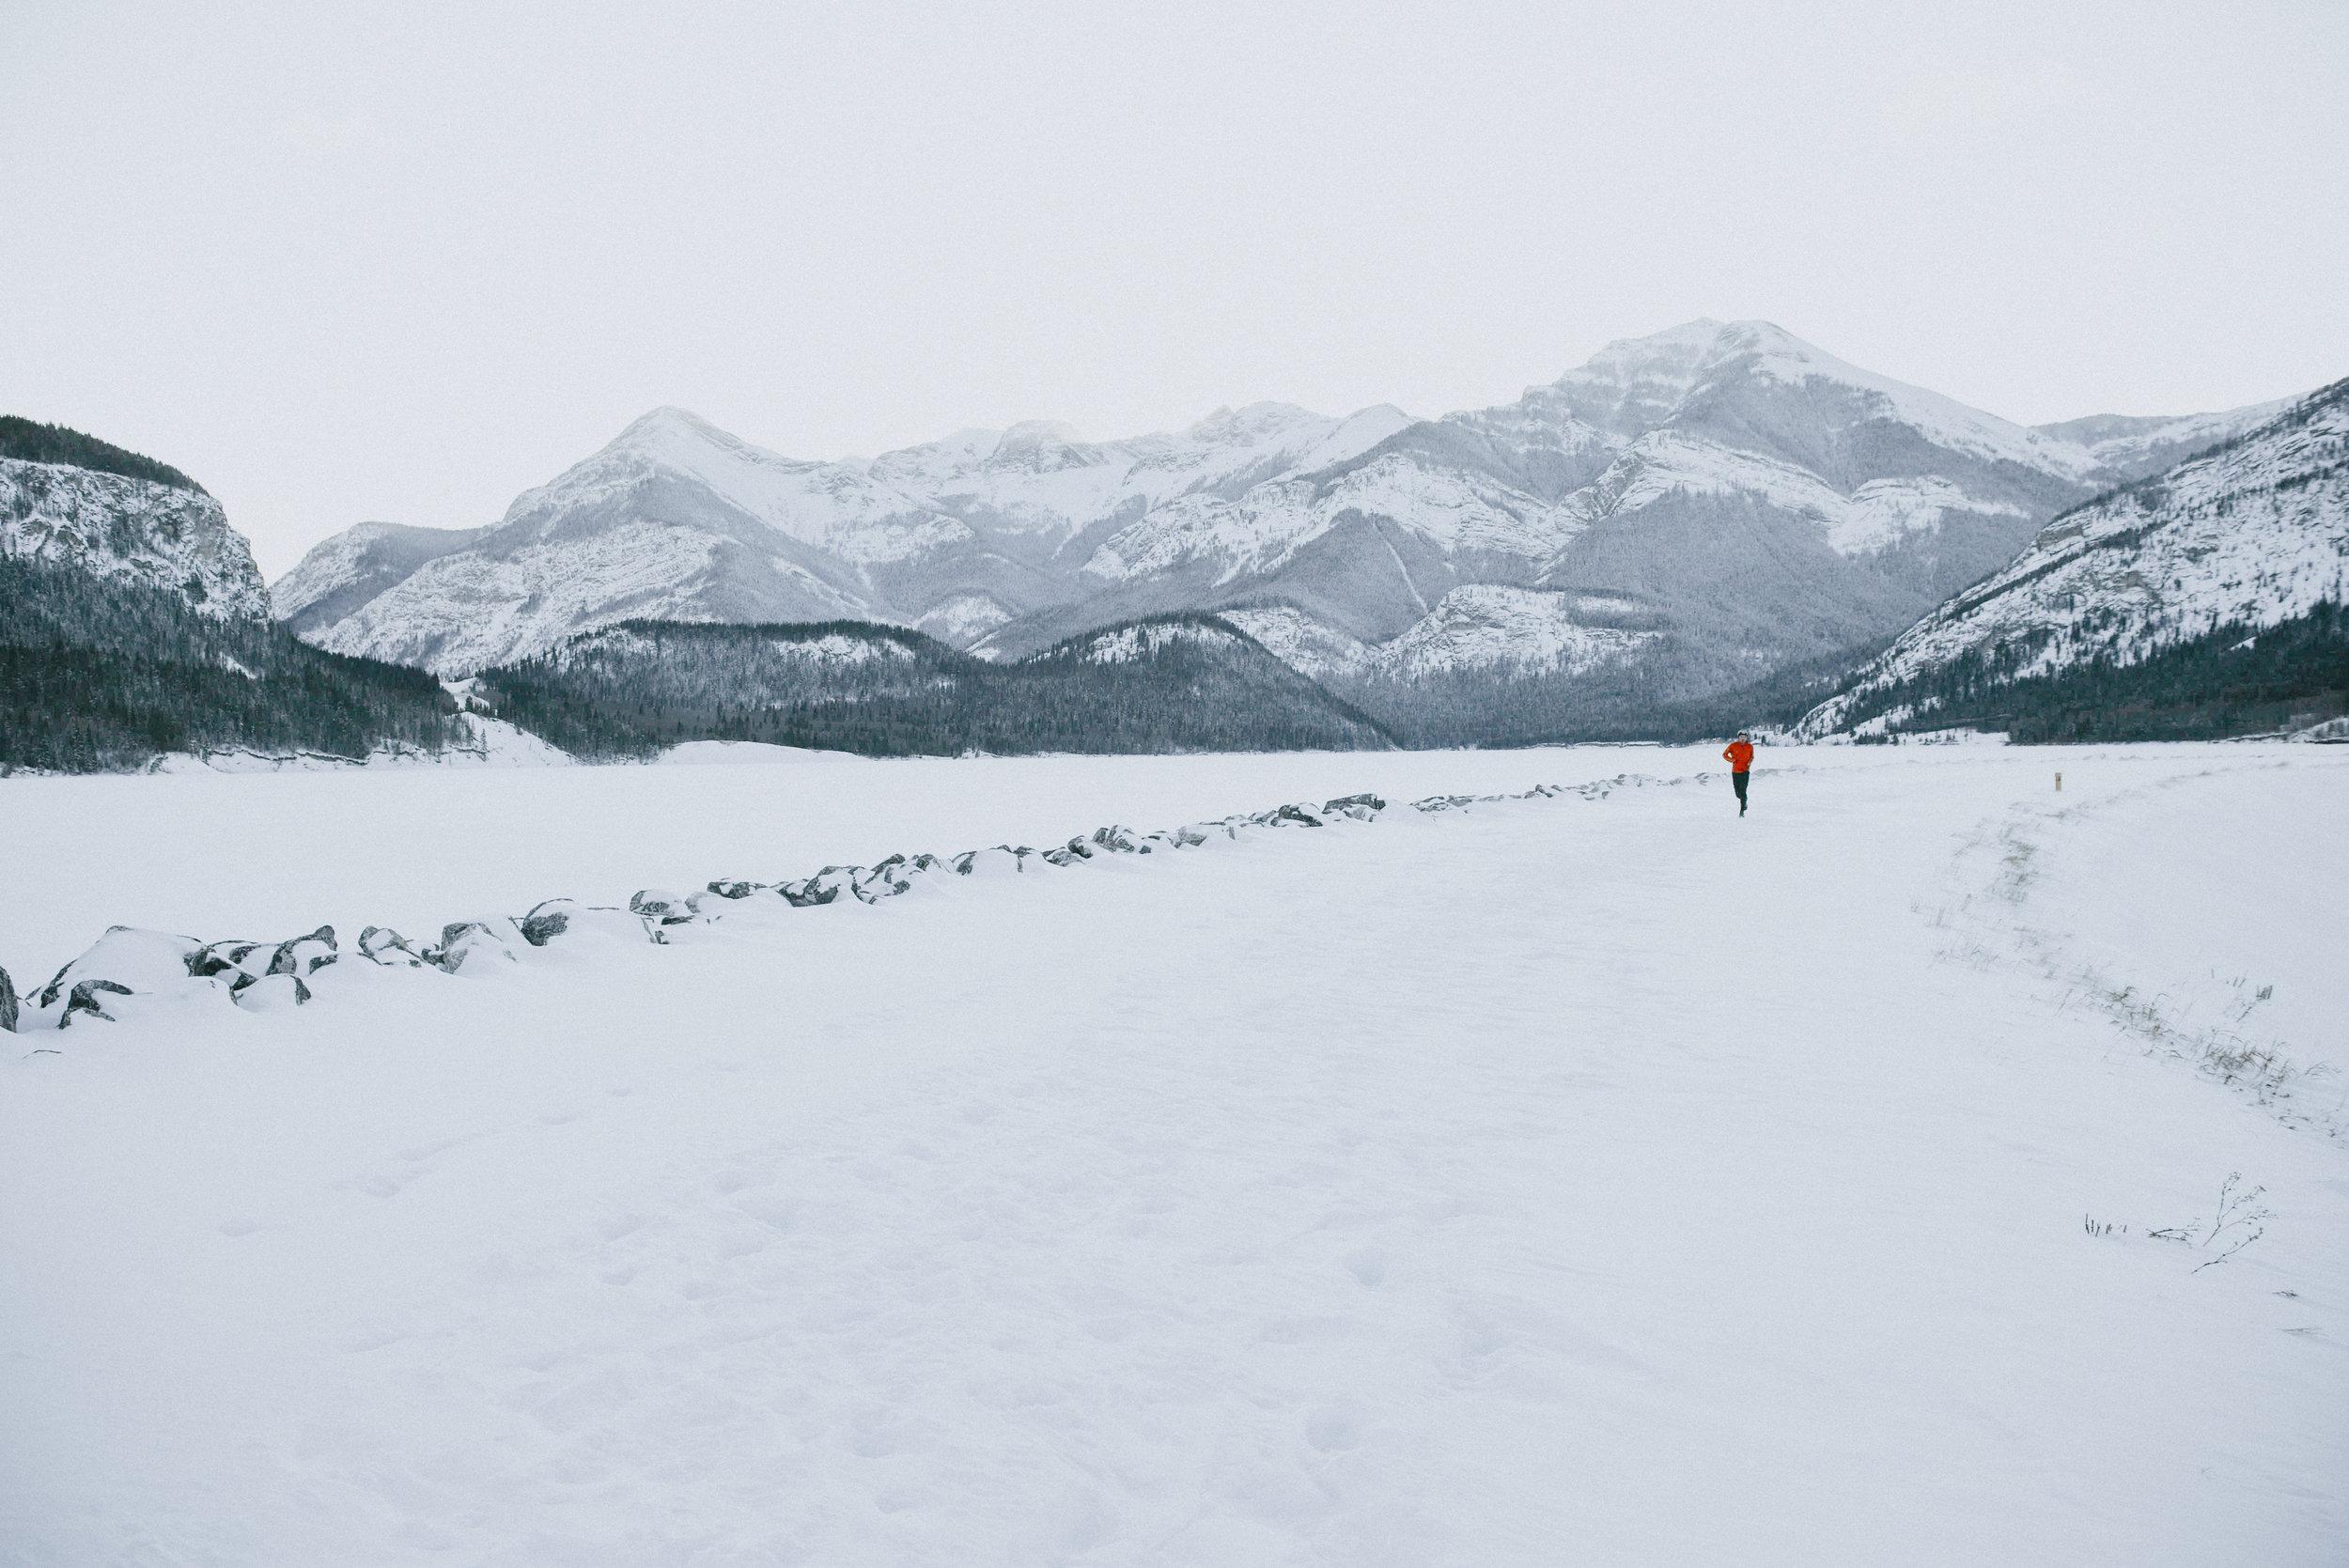 02/22/2019 Unknown Jogger, Barrier Dam, Kananaskis, Alberta